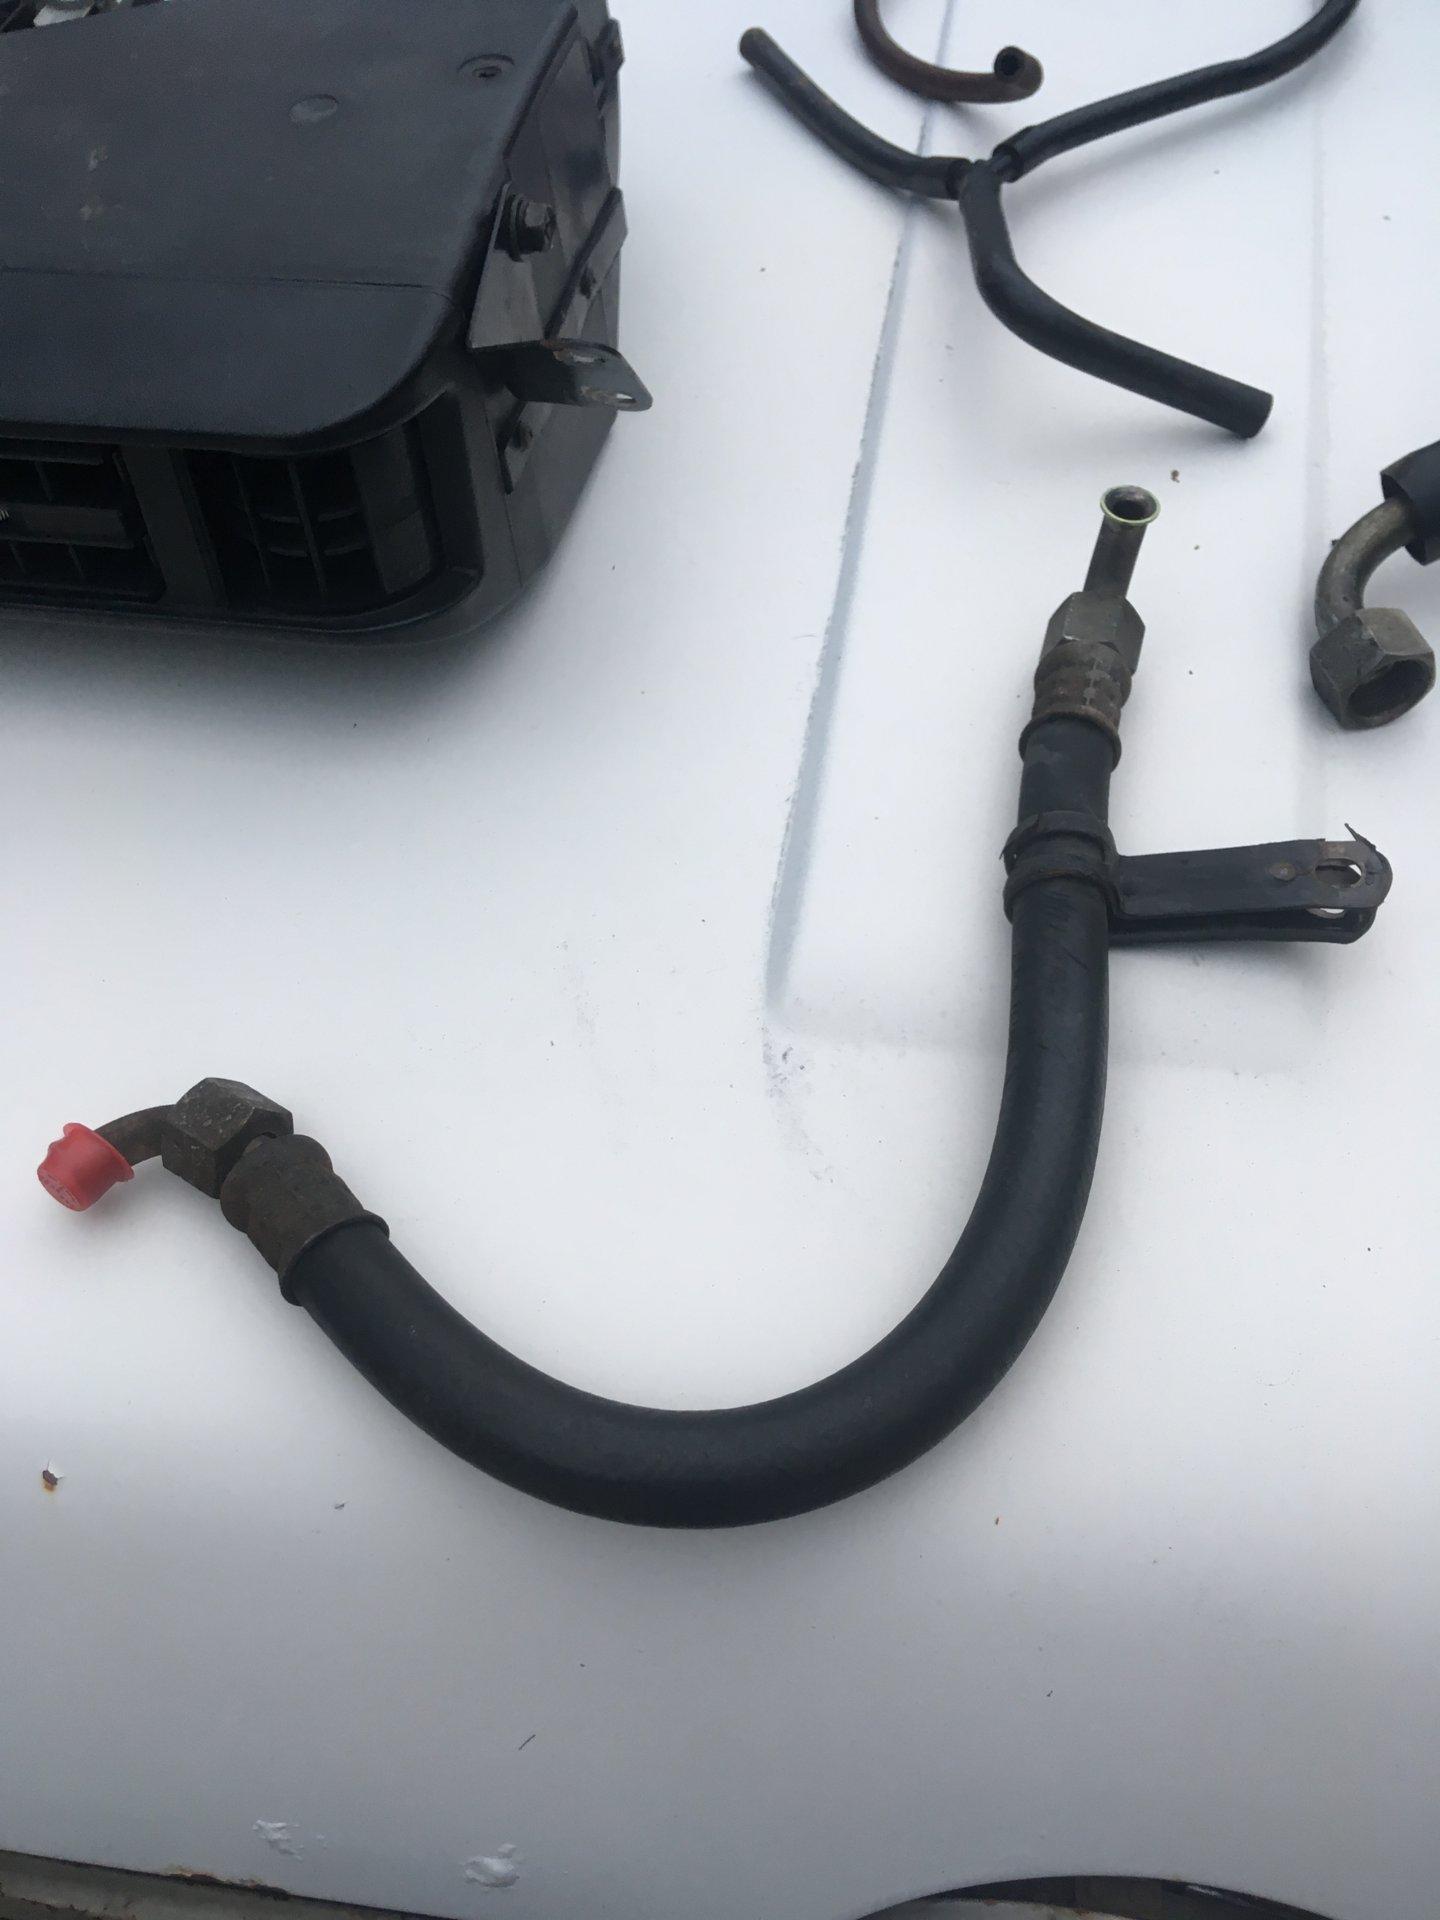 For Sale 82 Fj40 Factory Ac Unit Control Device L200 Duct Wiring Harness Adca361d F040 4bd1 974f F5fe9272d469jpeg